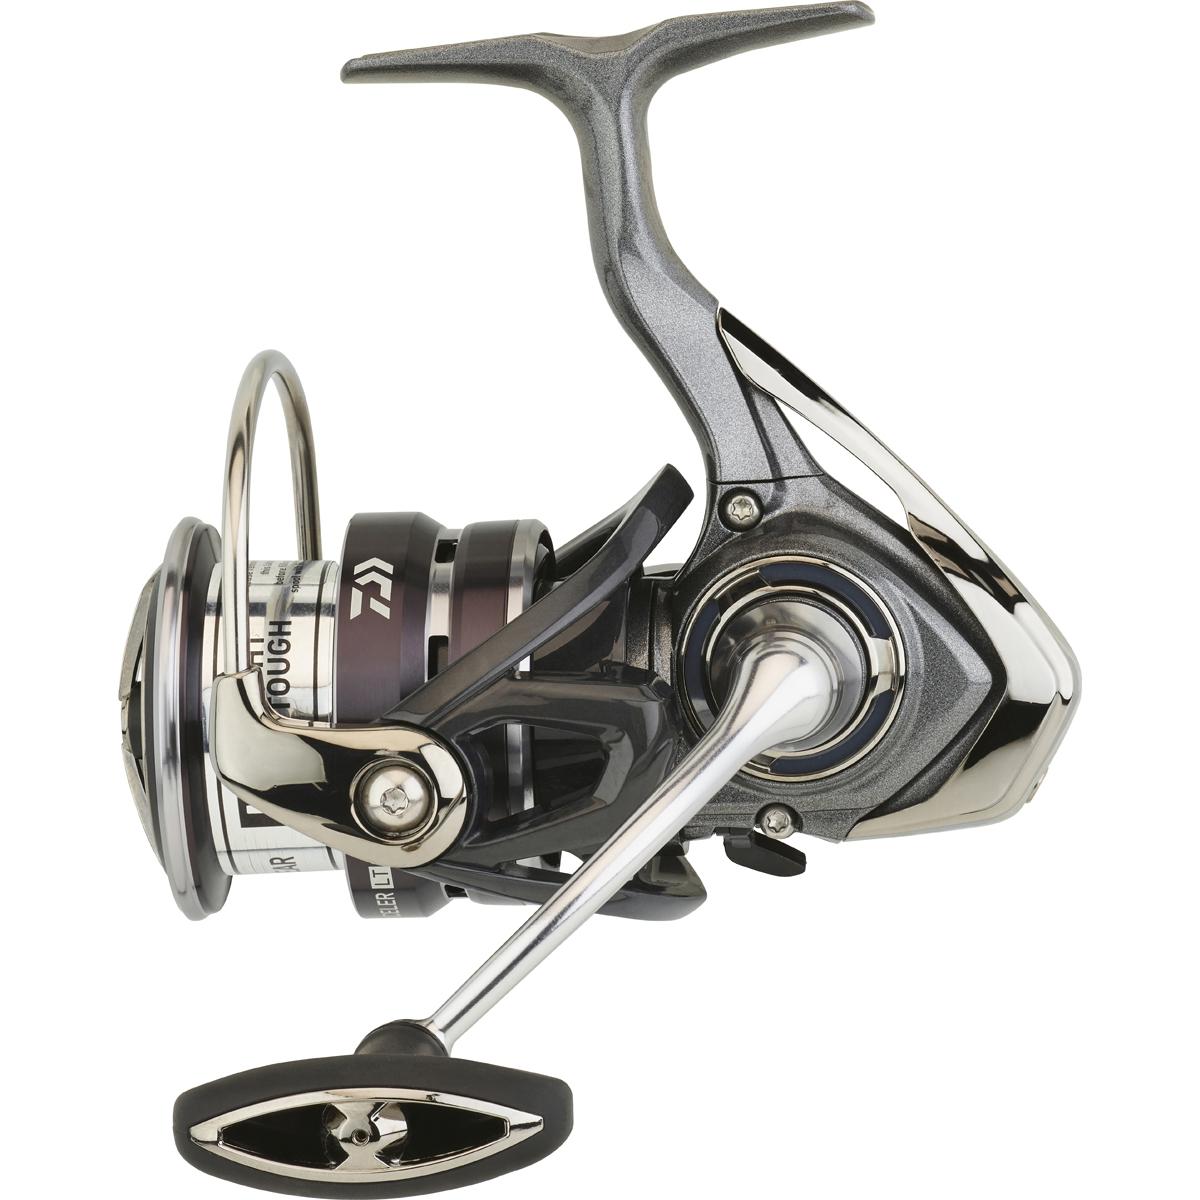 crankys moulinet spinning daiwa nouveau exceler 2020 LT pêche fishing